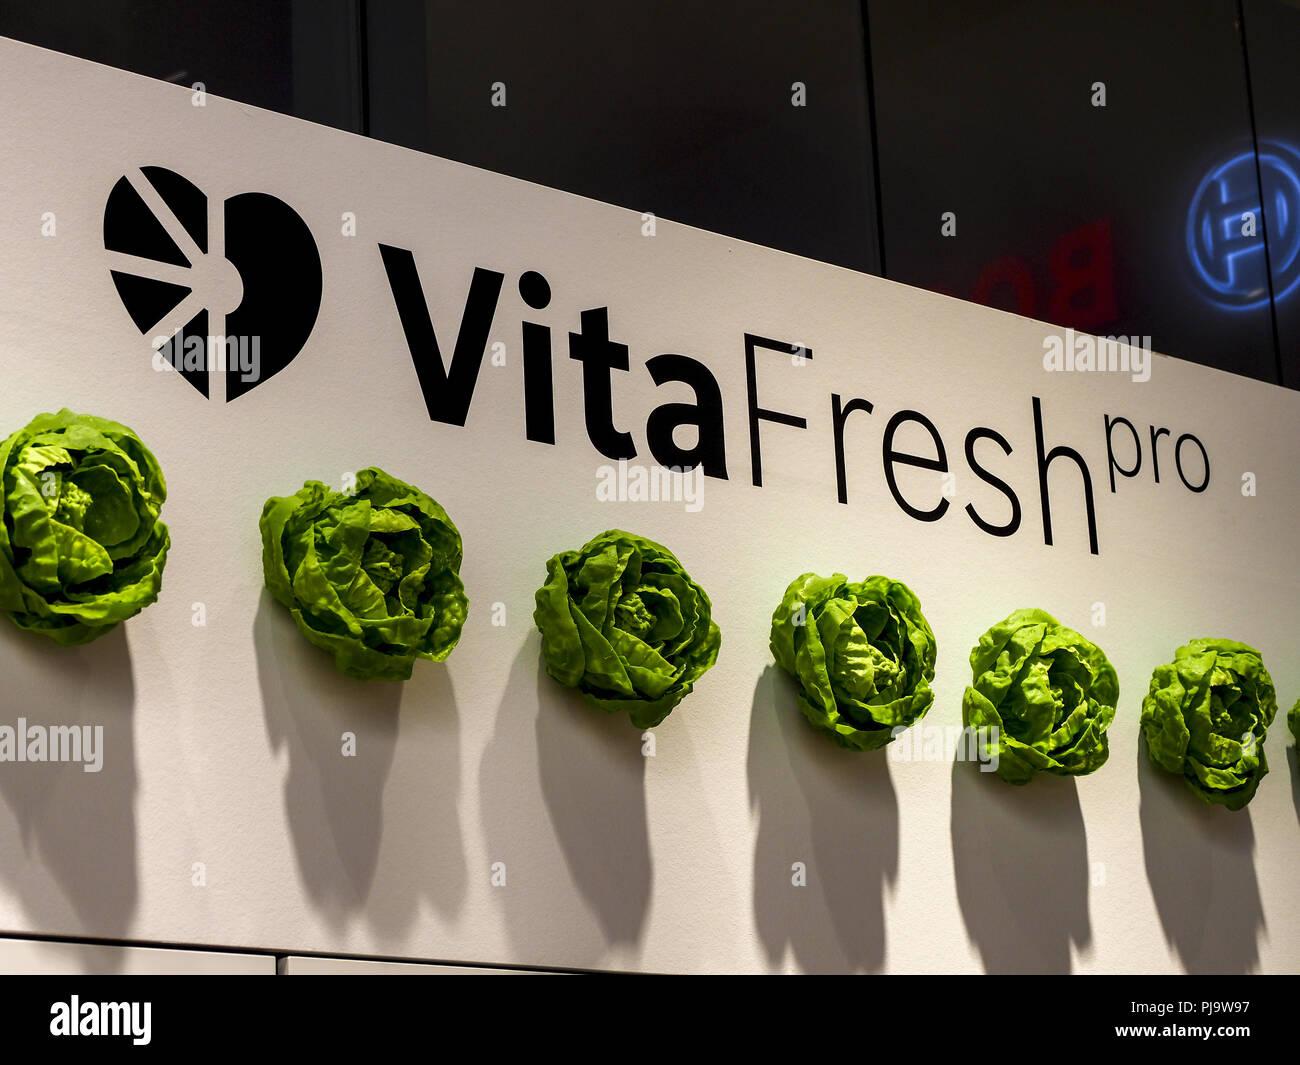 Bosch Vitafresh Kühlschrank : Bosch vitafresh kühlschrank ifa 2018 berlin internationale